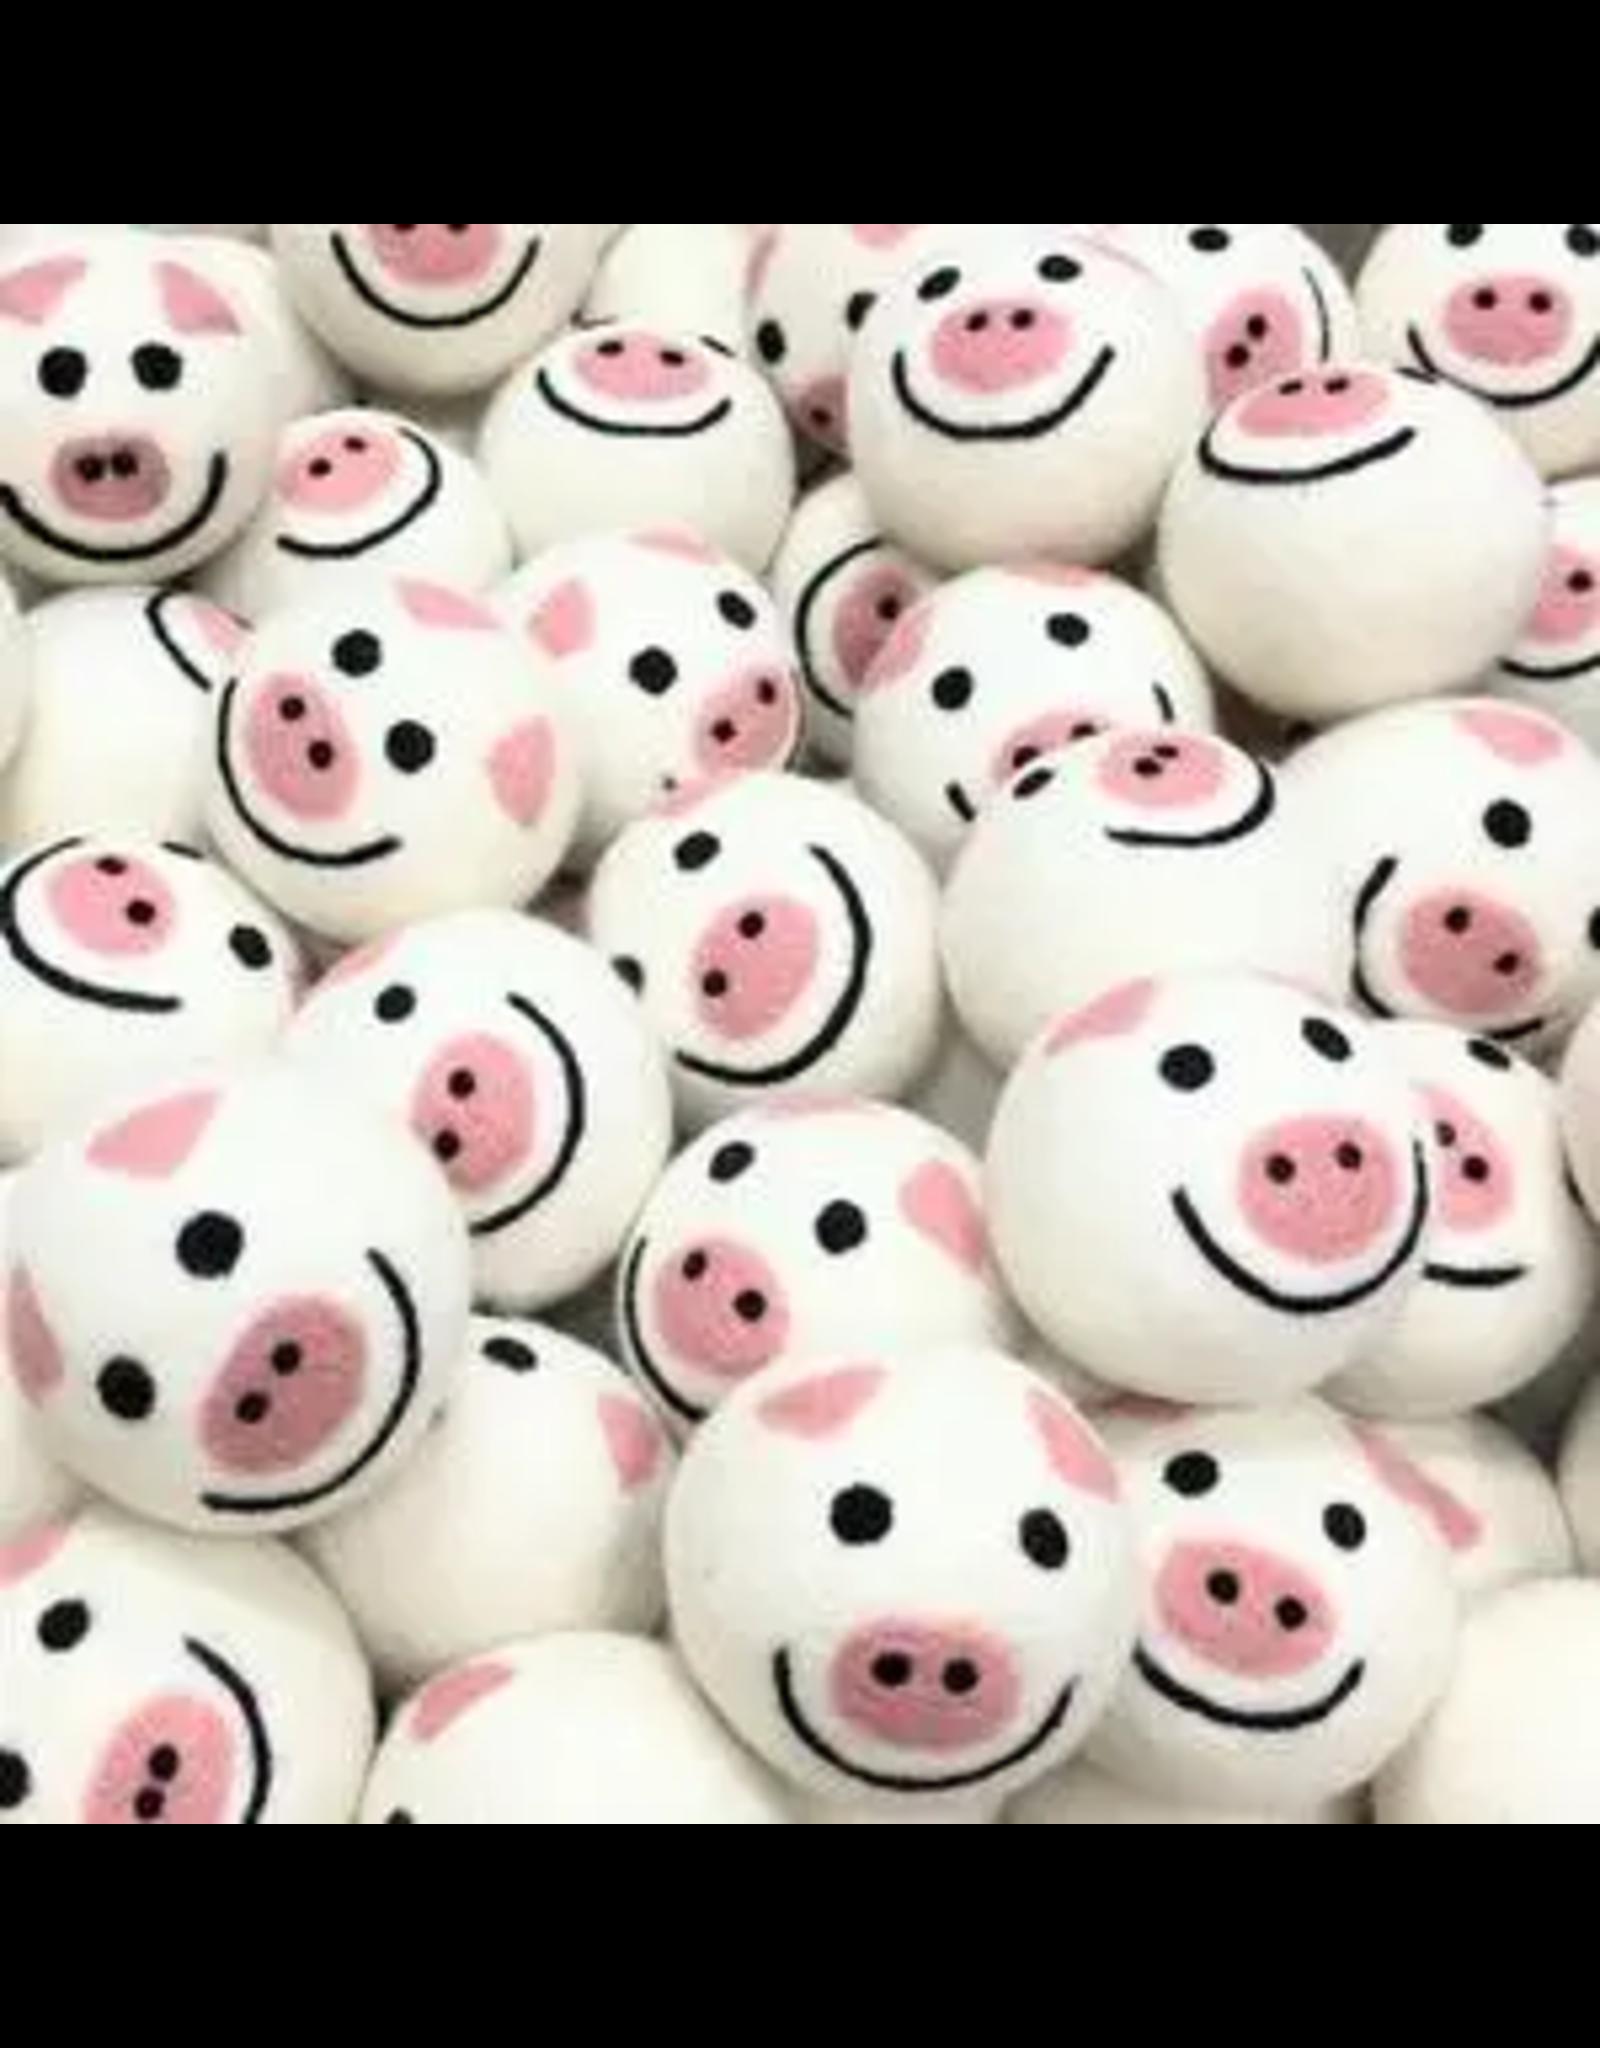 Friendsheep Piggy Band Wool Dryer Balls